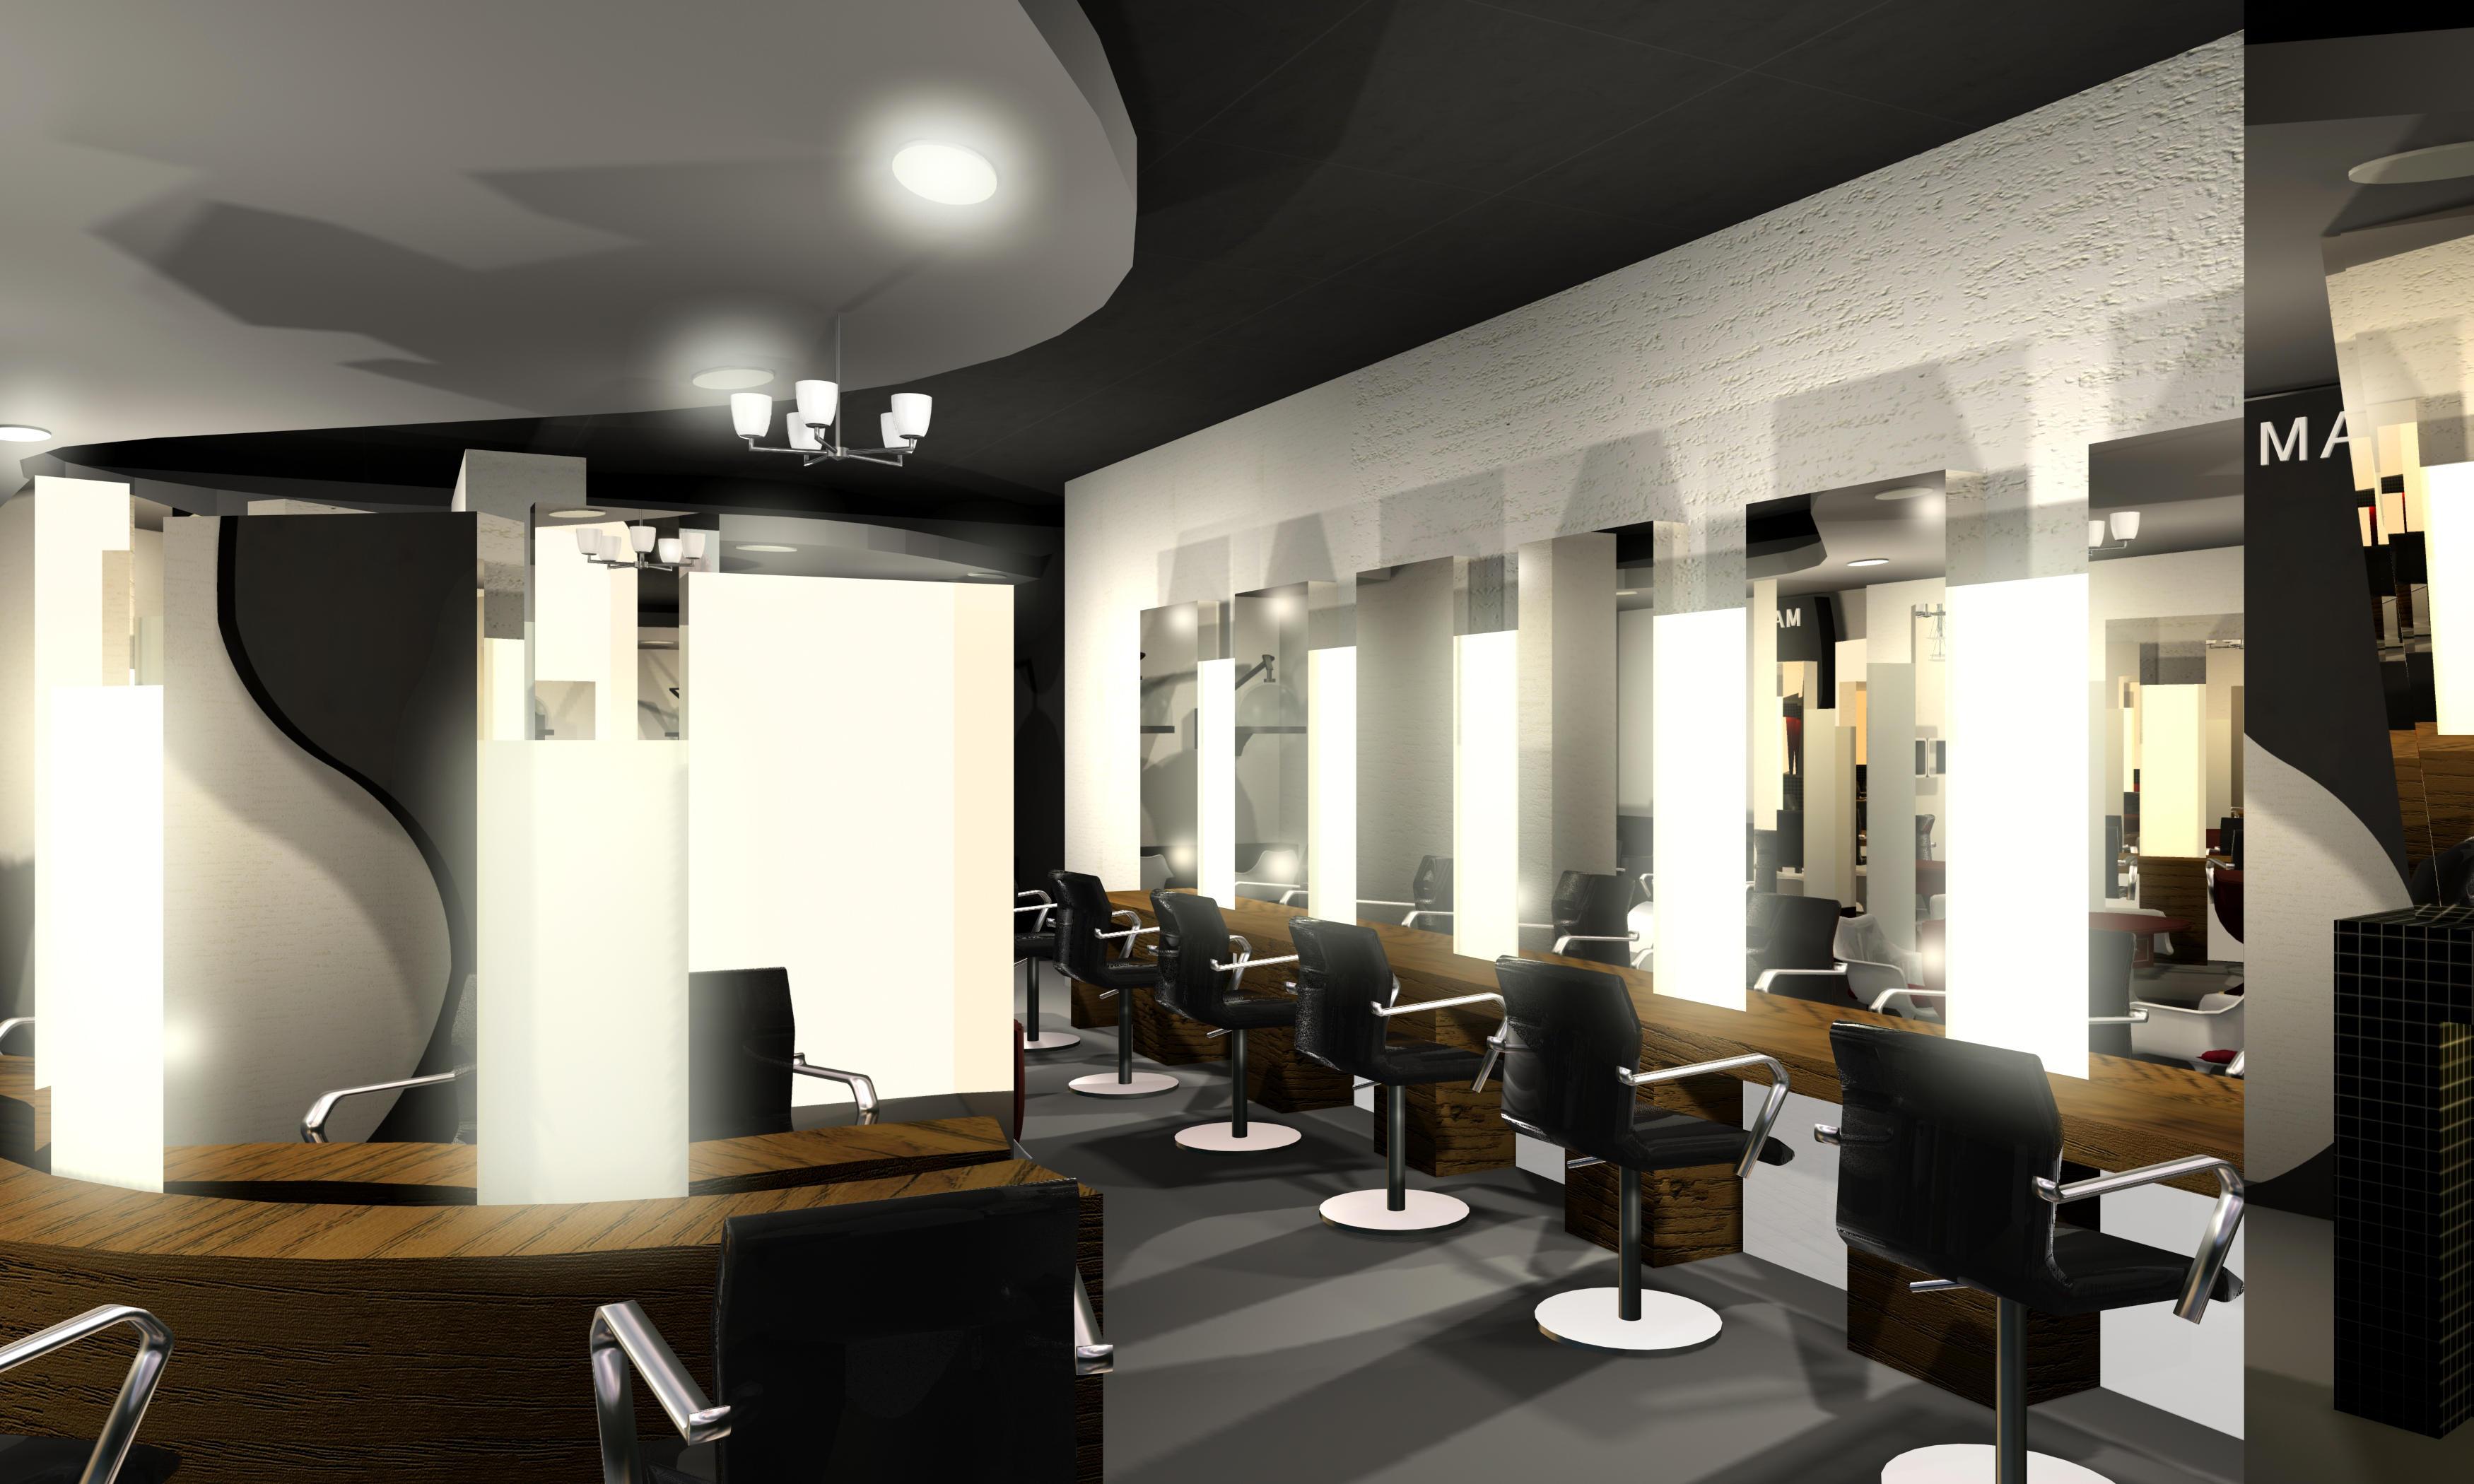 Charming Nail Salon Interior Design Ideas Pictures   Interior View Of Salon By  Jianzwindz On DeviantArt